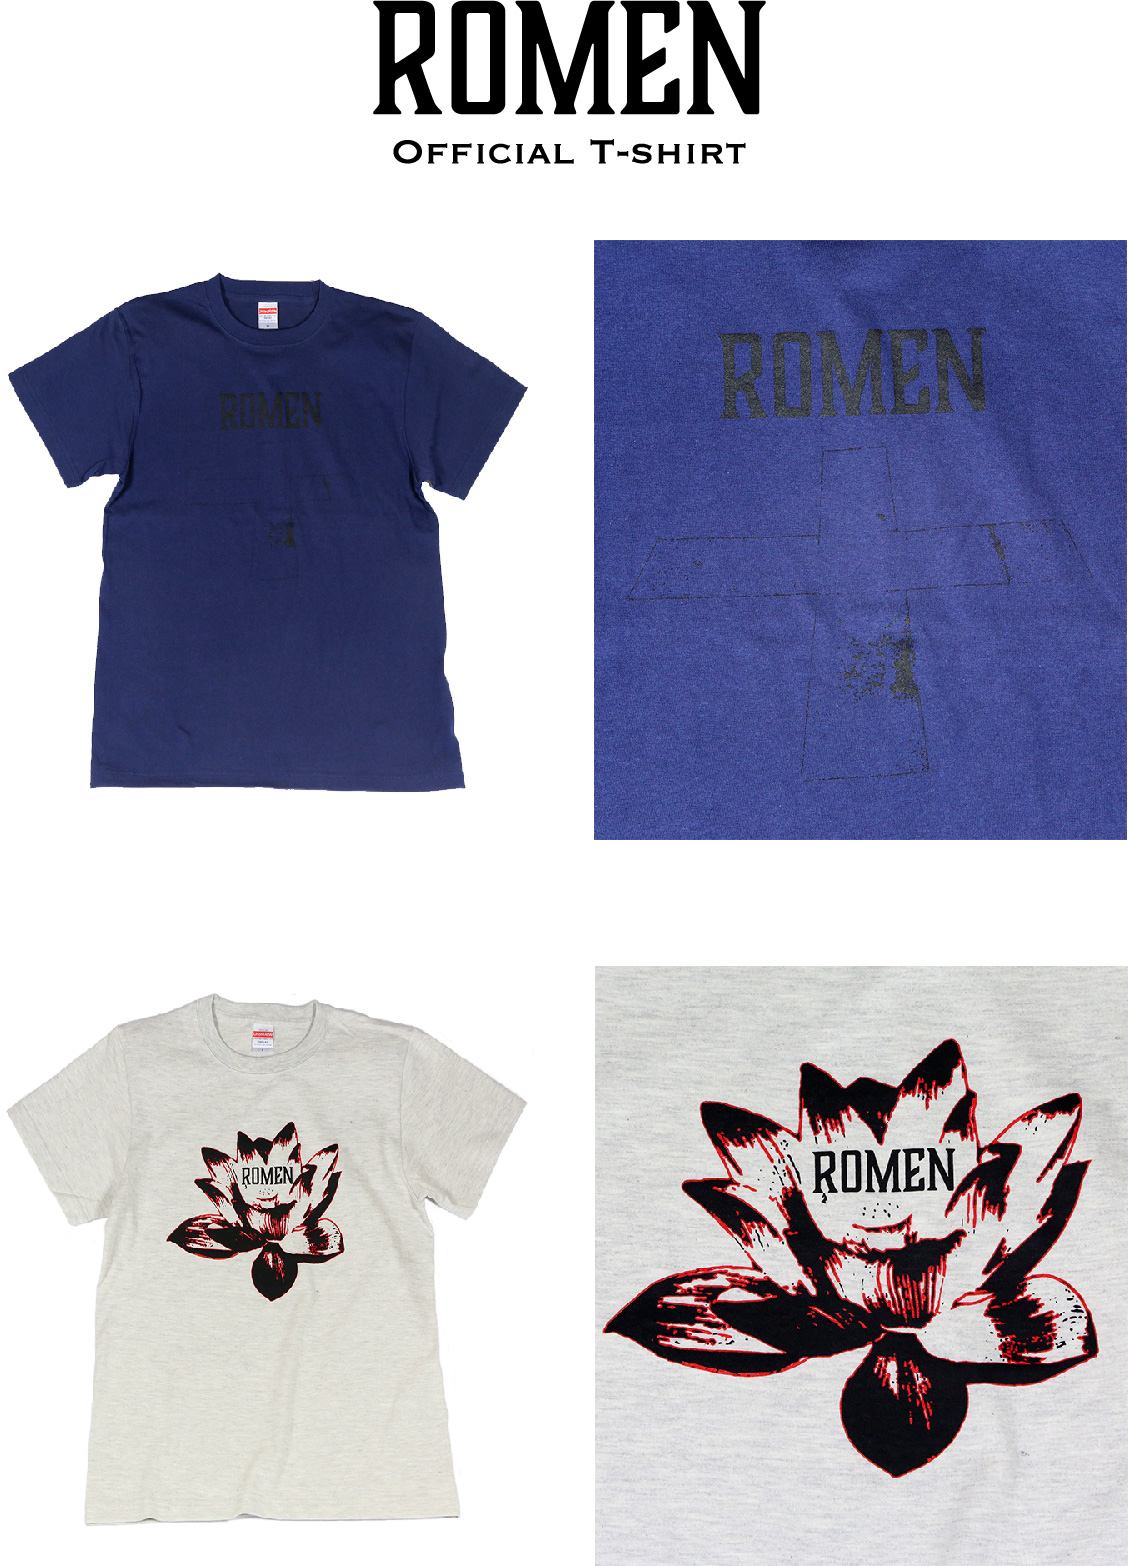 romen. T-shirt